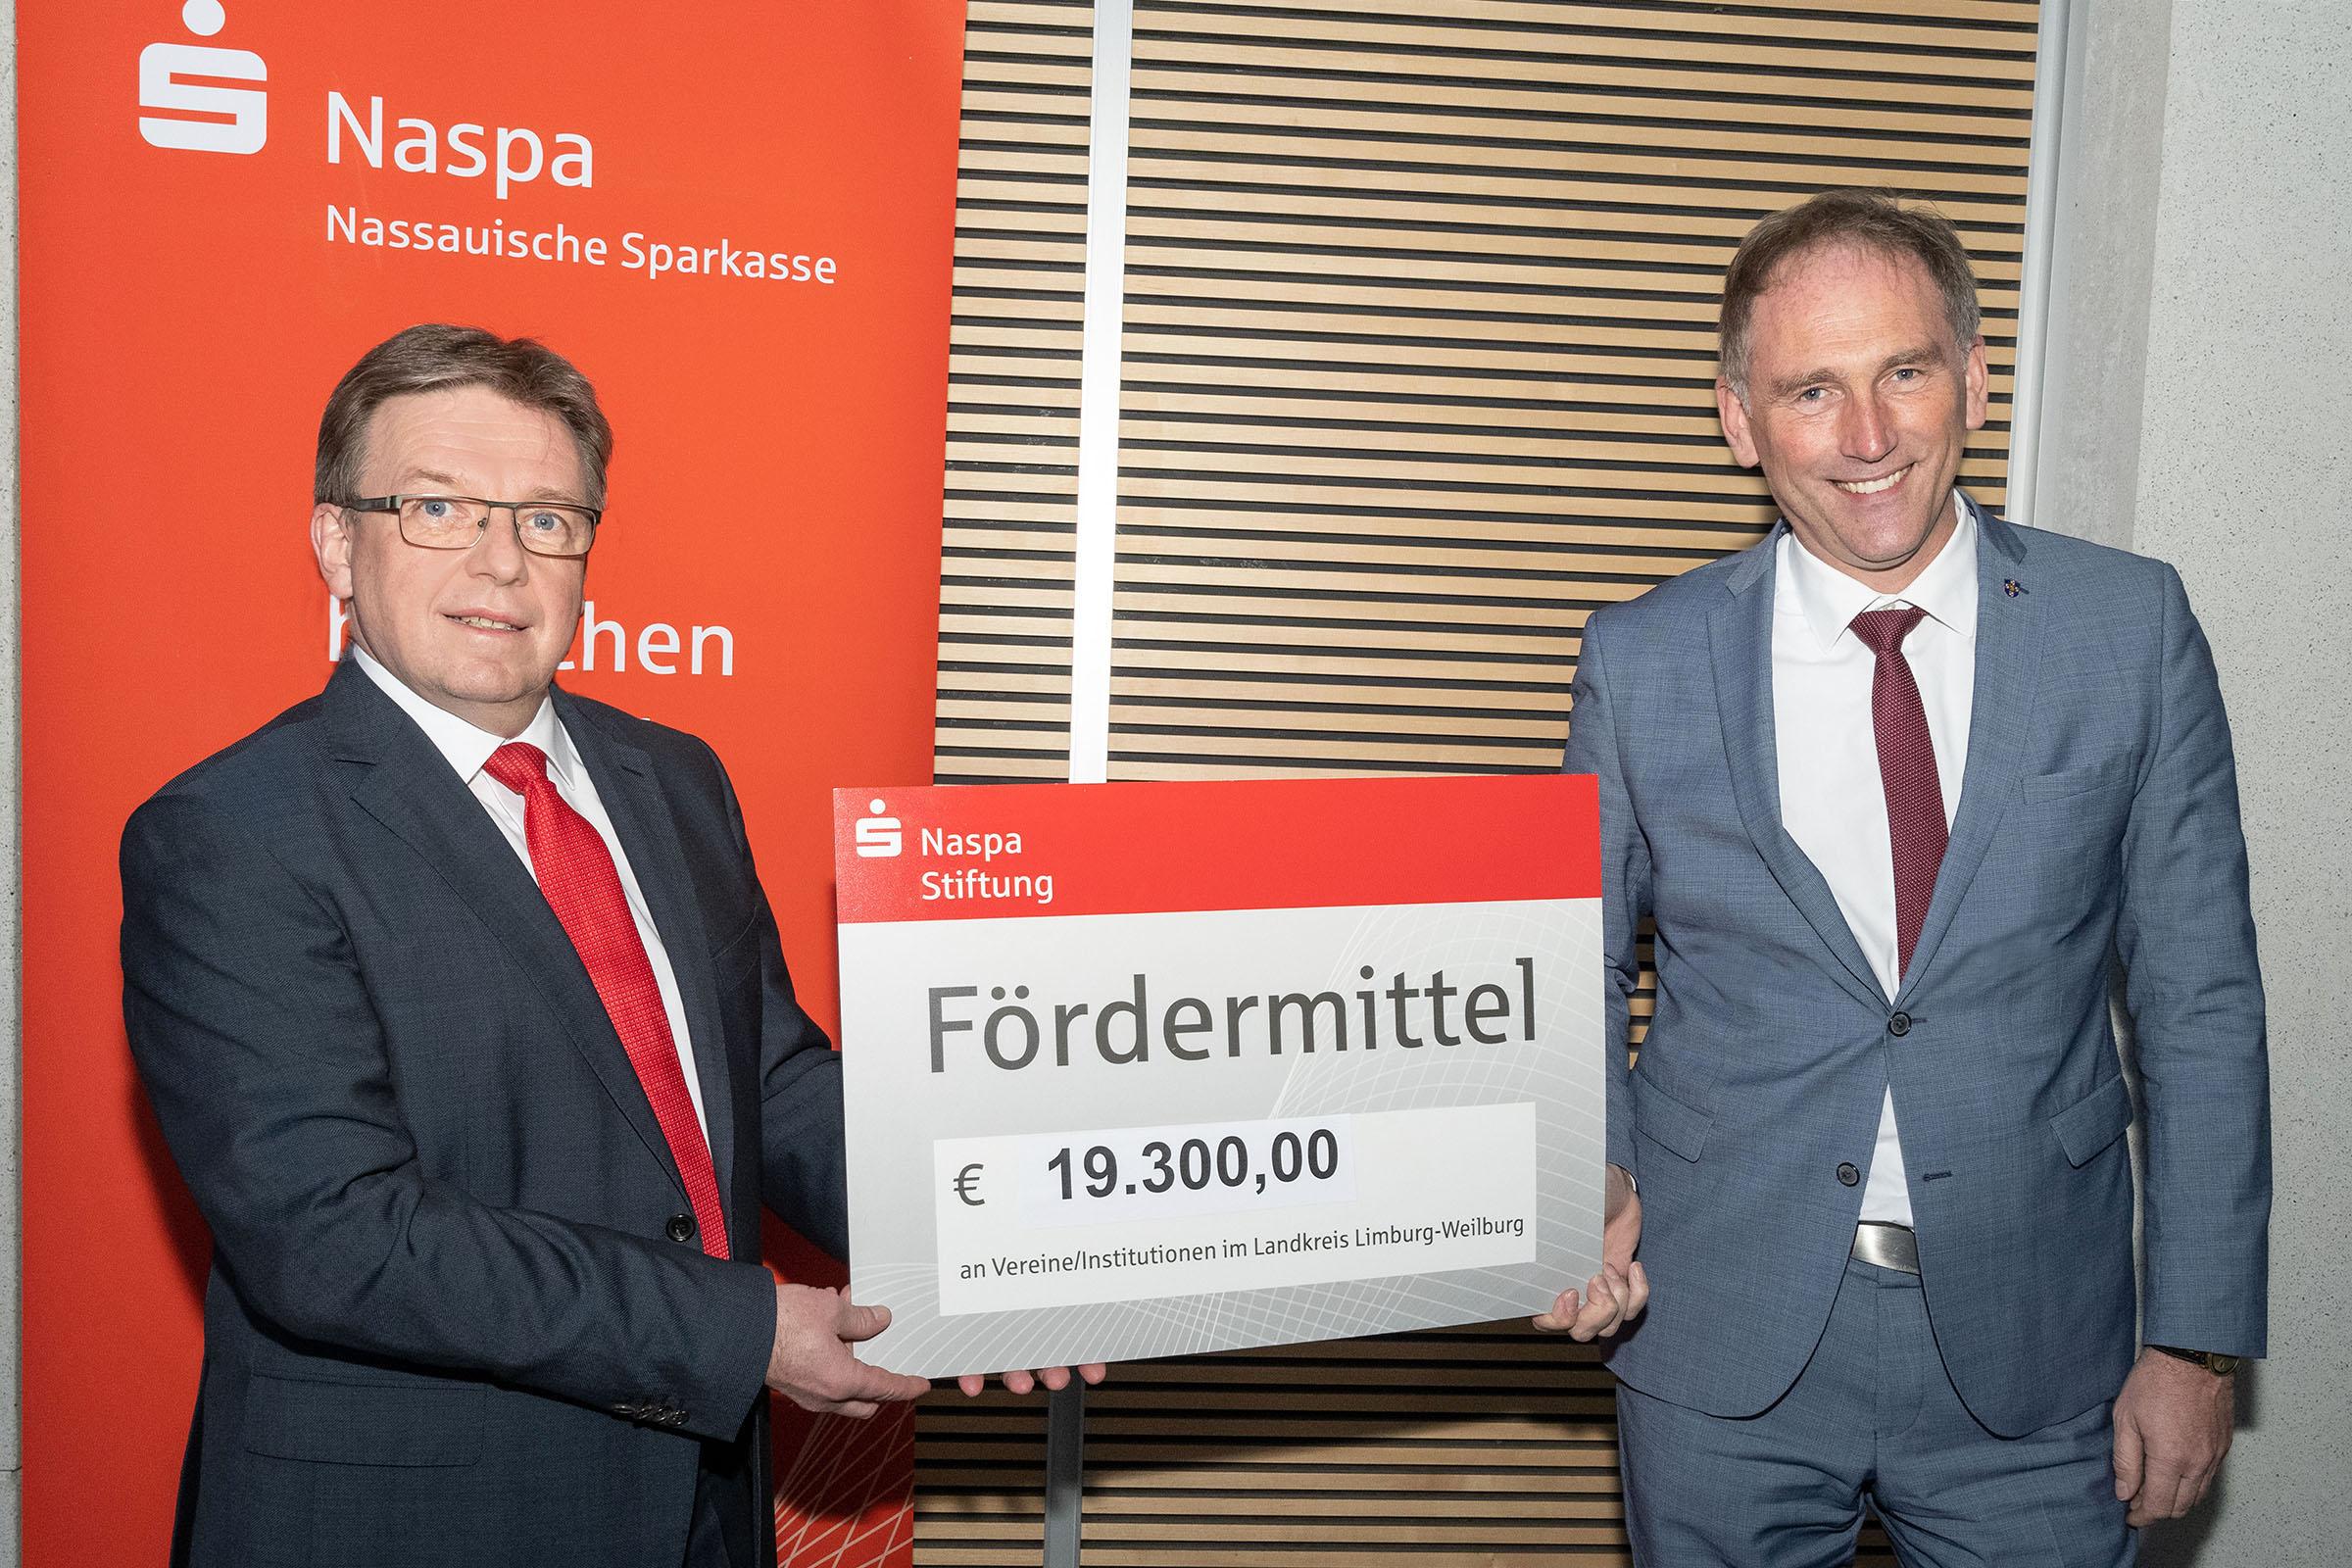 Presse-Limburg-Weilburg-Fördermittel-Naspa-Stiftung.jpg (11.01.2021 11:26)